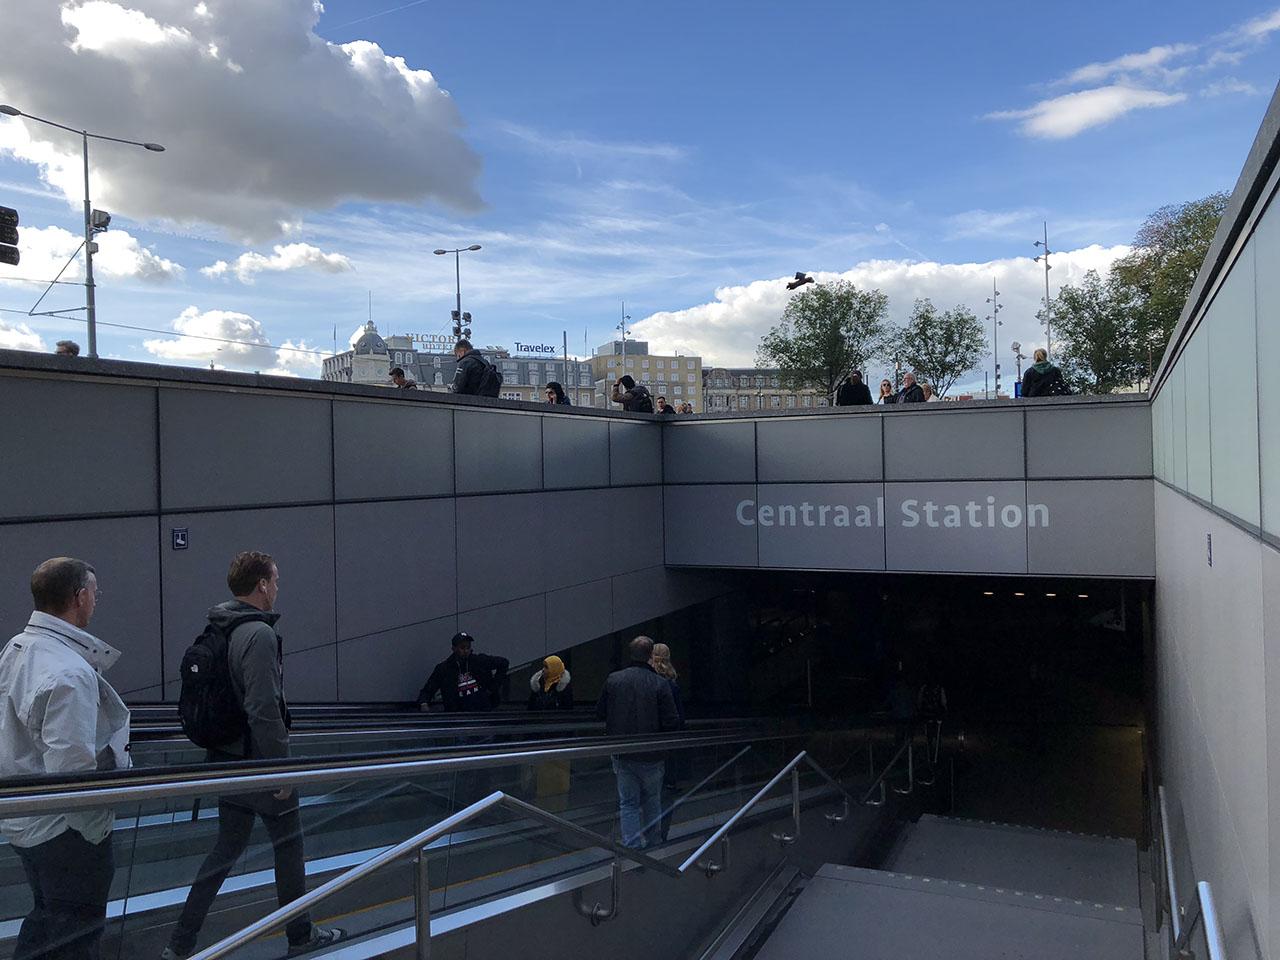 Centraal Station, foto gemaakt met iPhone 8 Plus